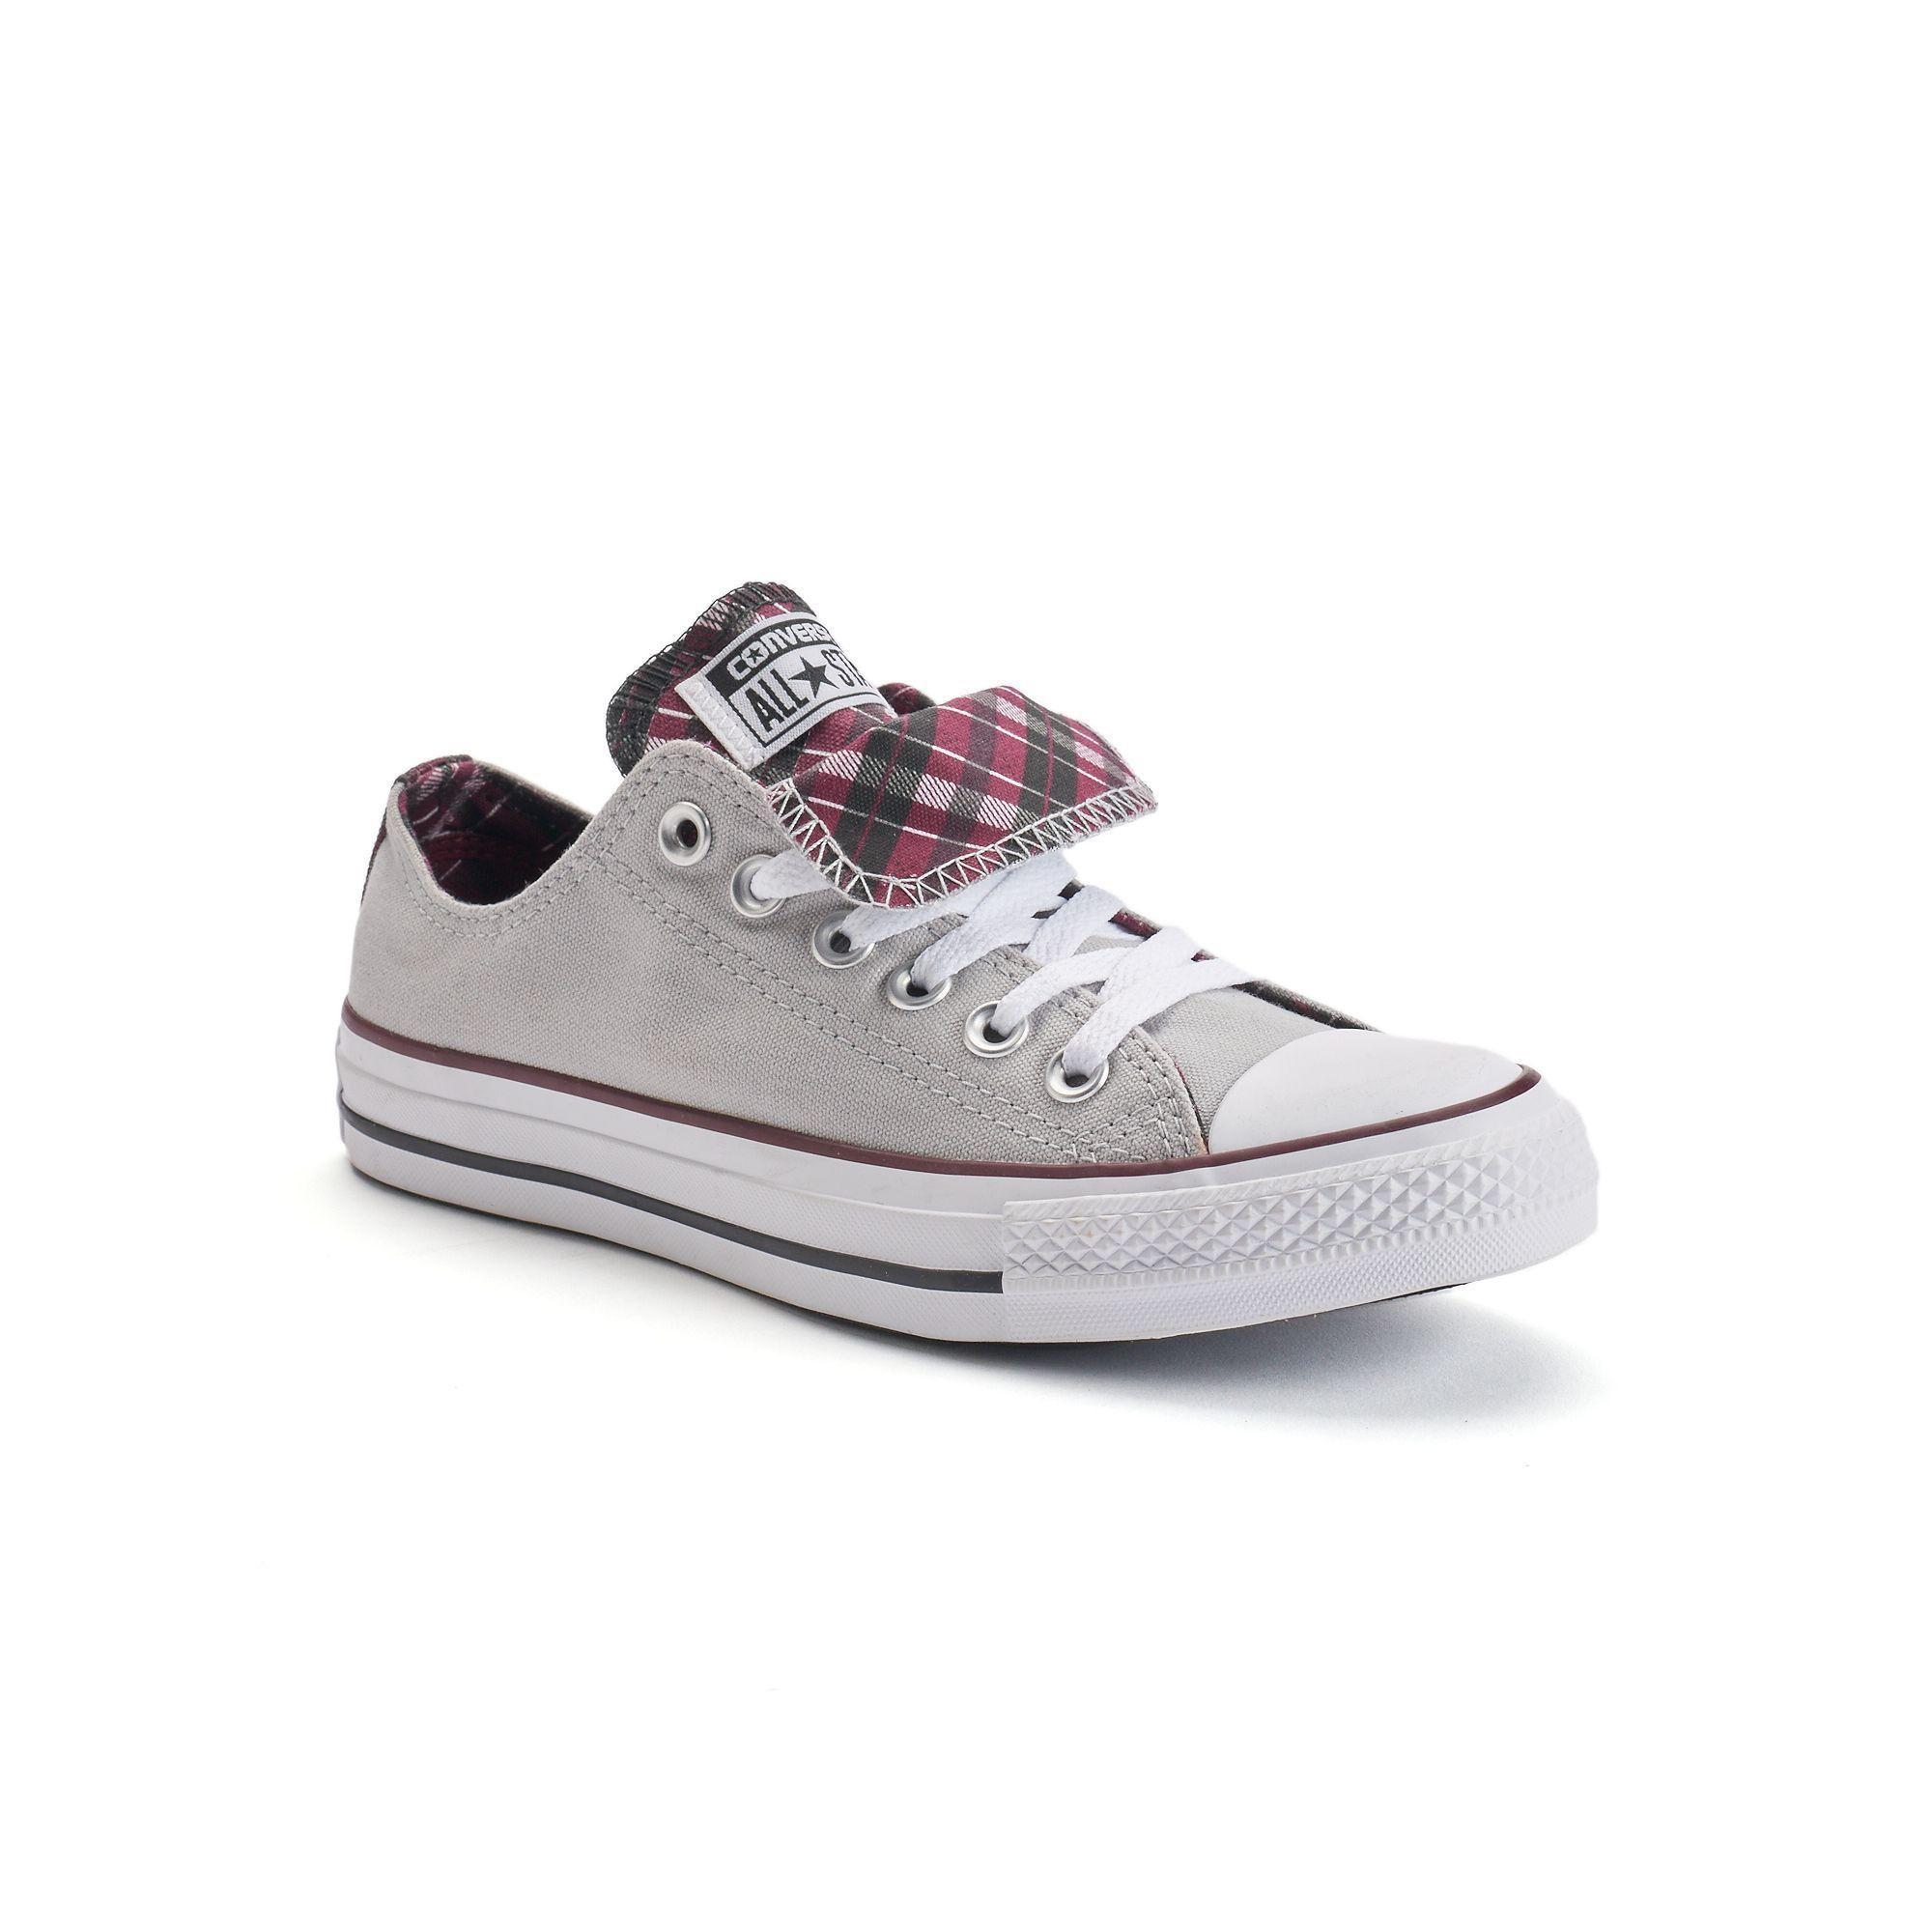 converse chuck taylor size 5